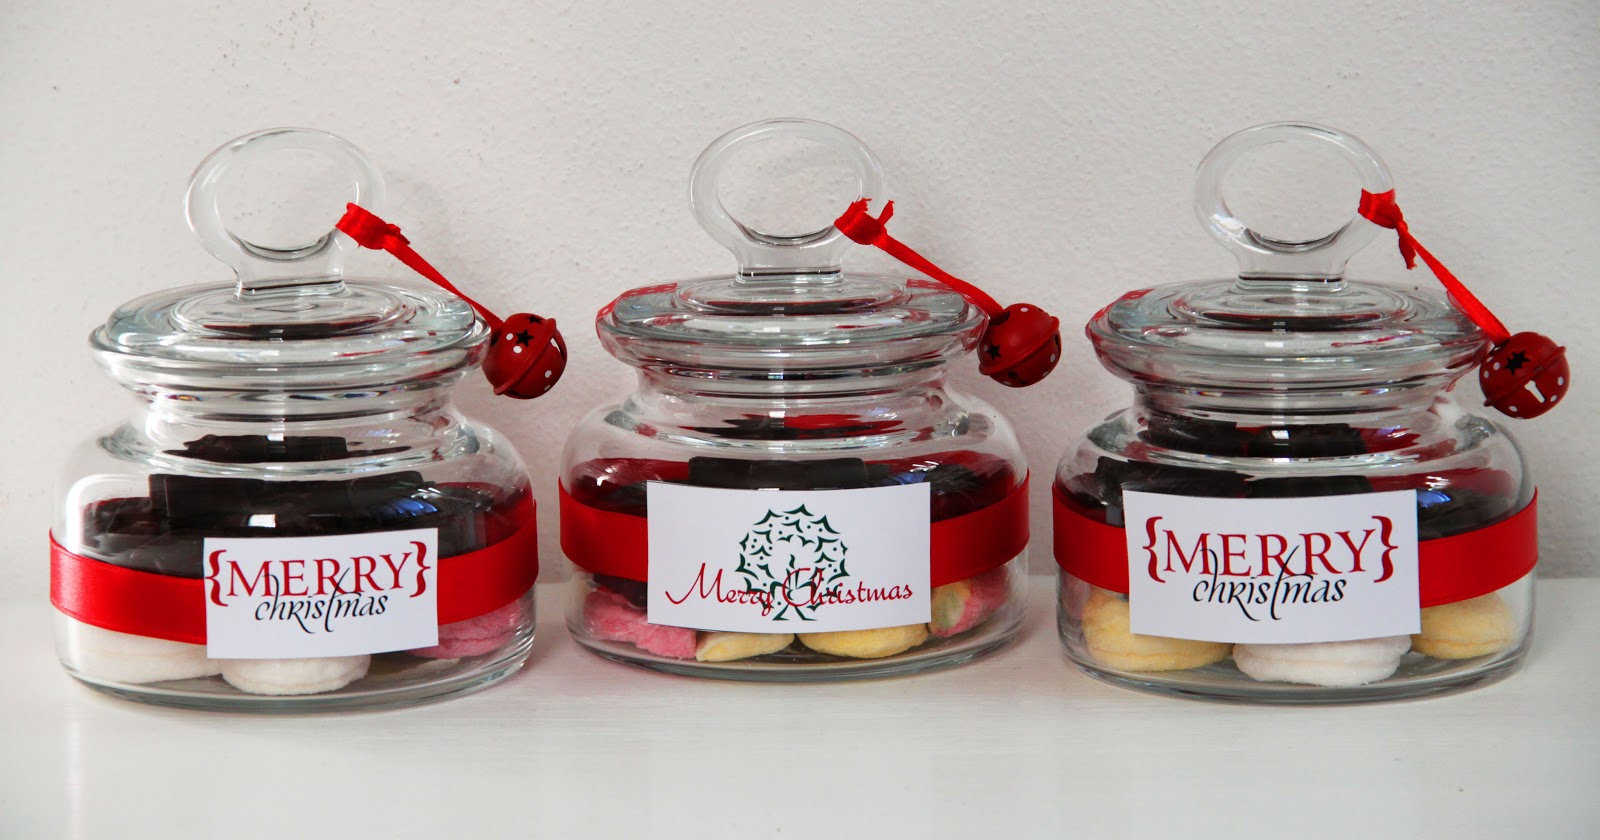 Emejing Idee Regali Di Natale Fai Da Te Cucina Images - ferrorods.us ...